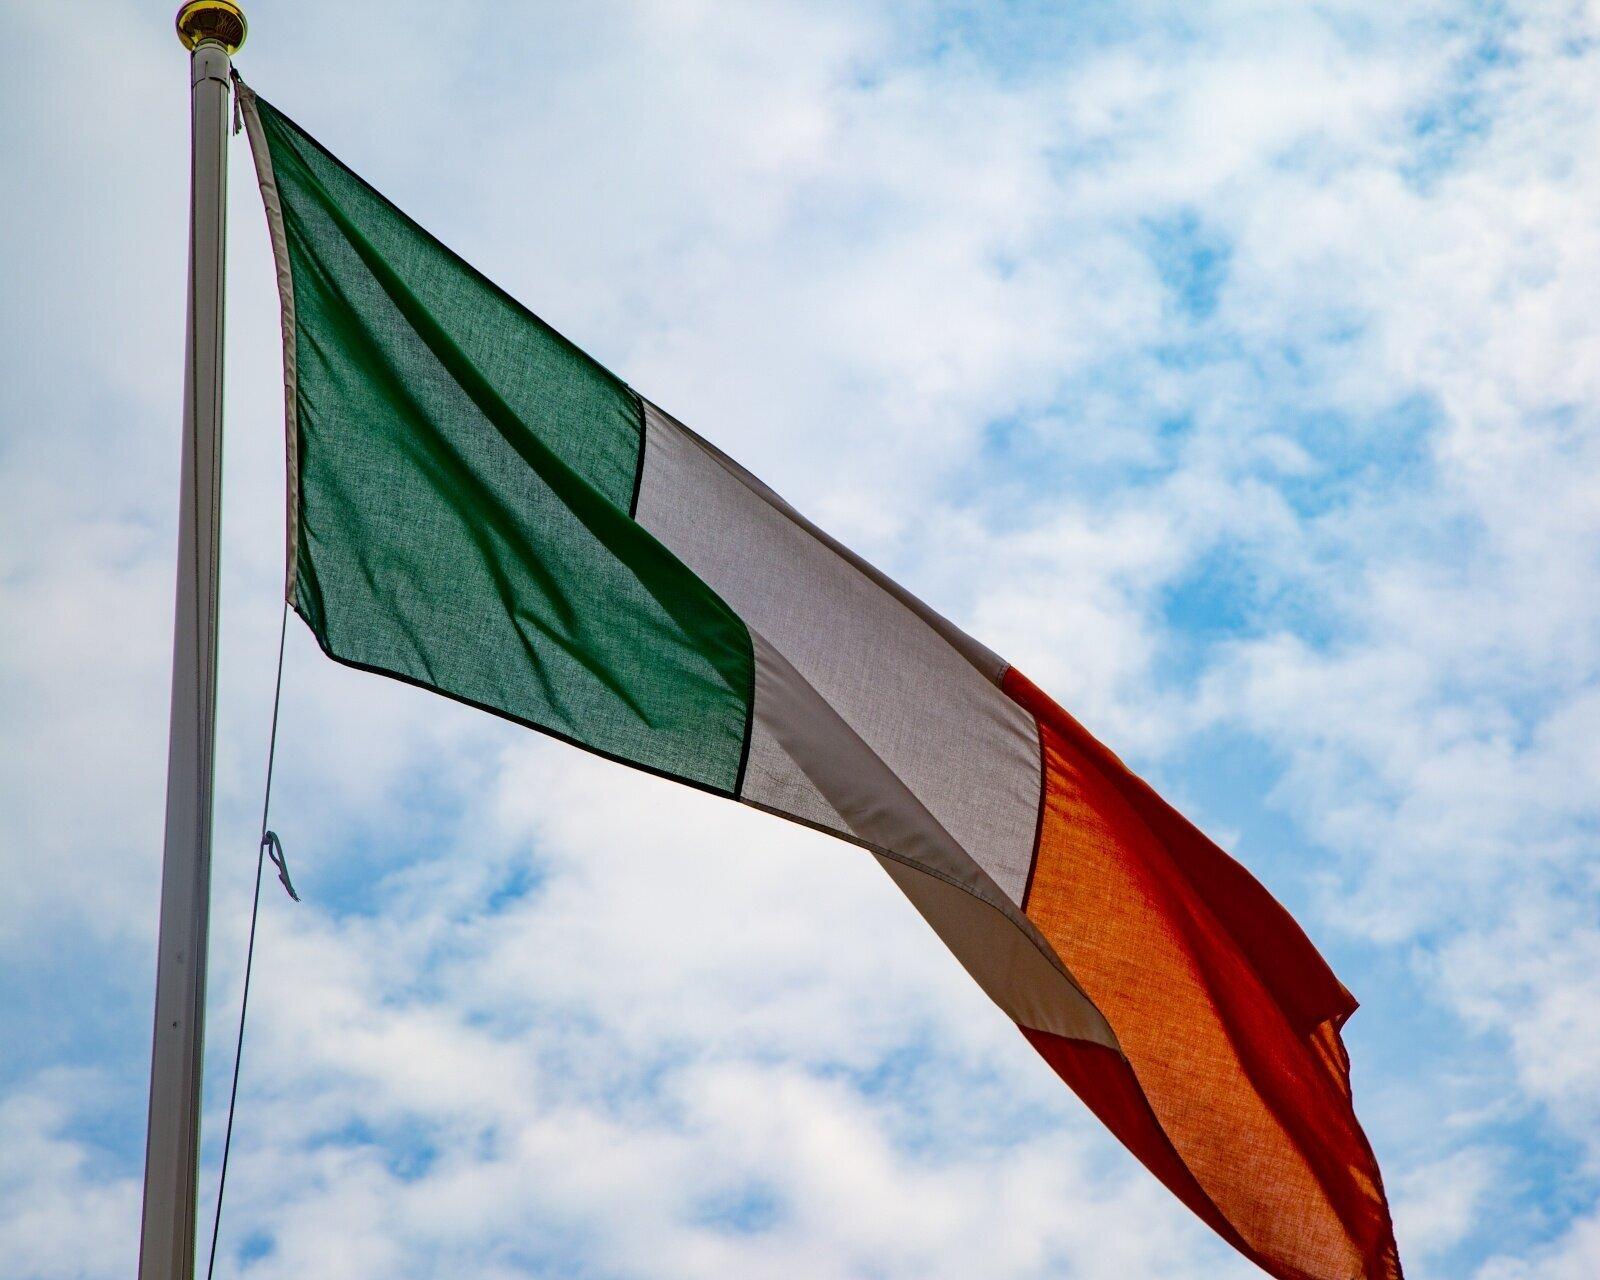 National Flag - The Irish Tricolour Flag